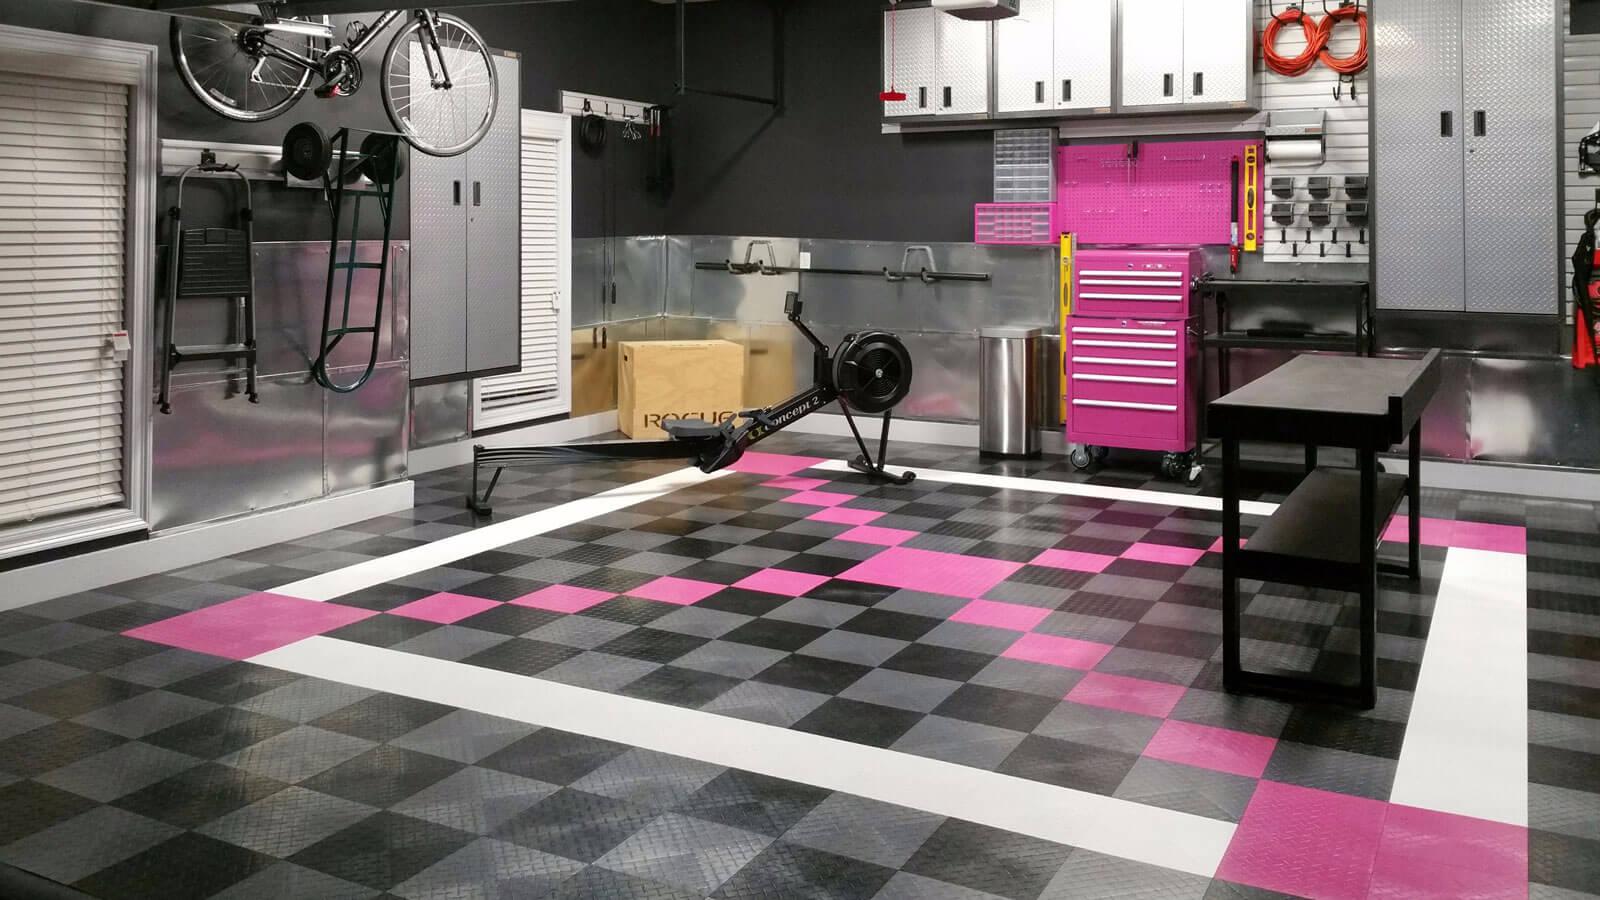 Garage floor with a pink x.